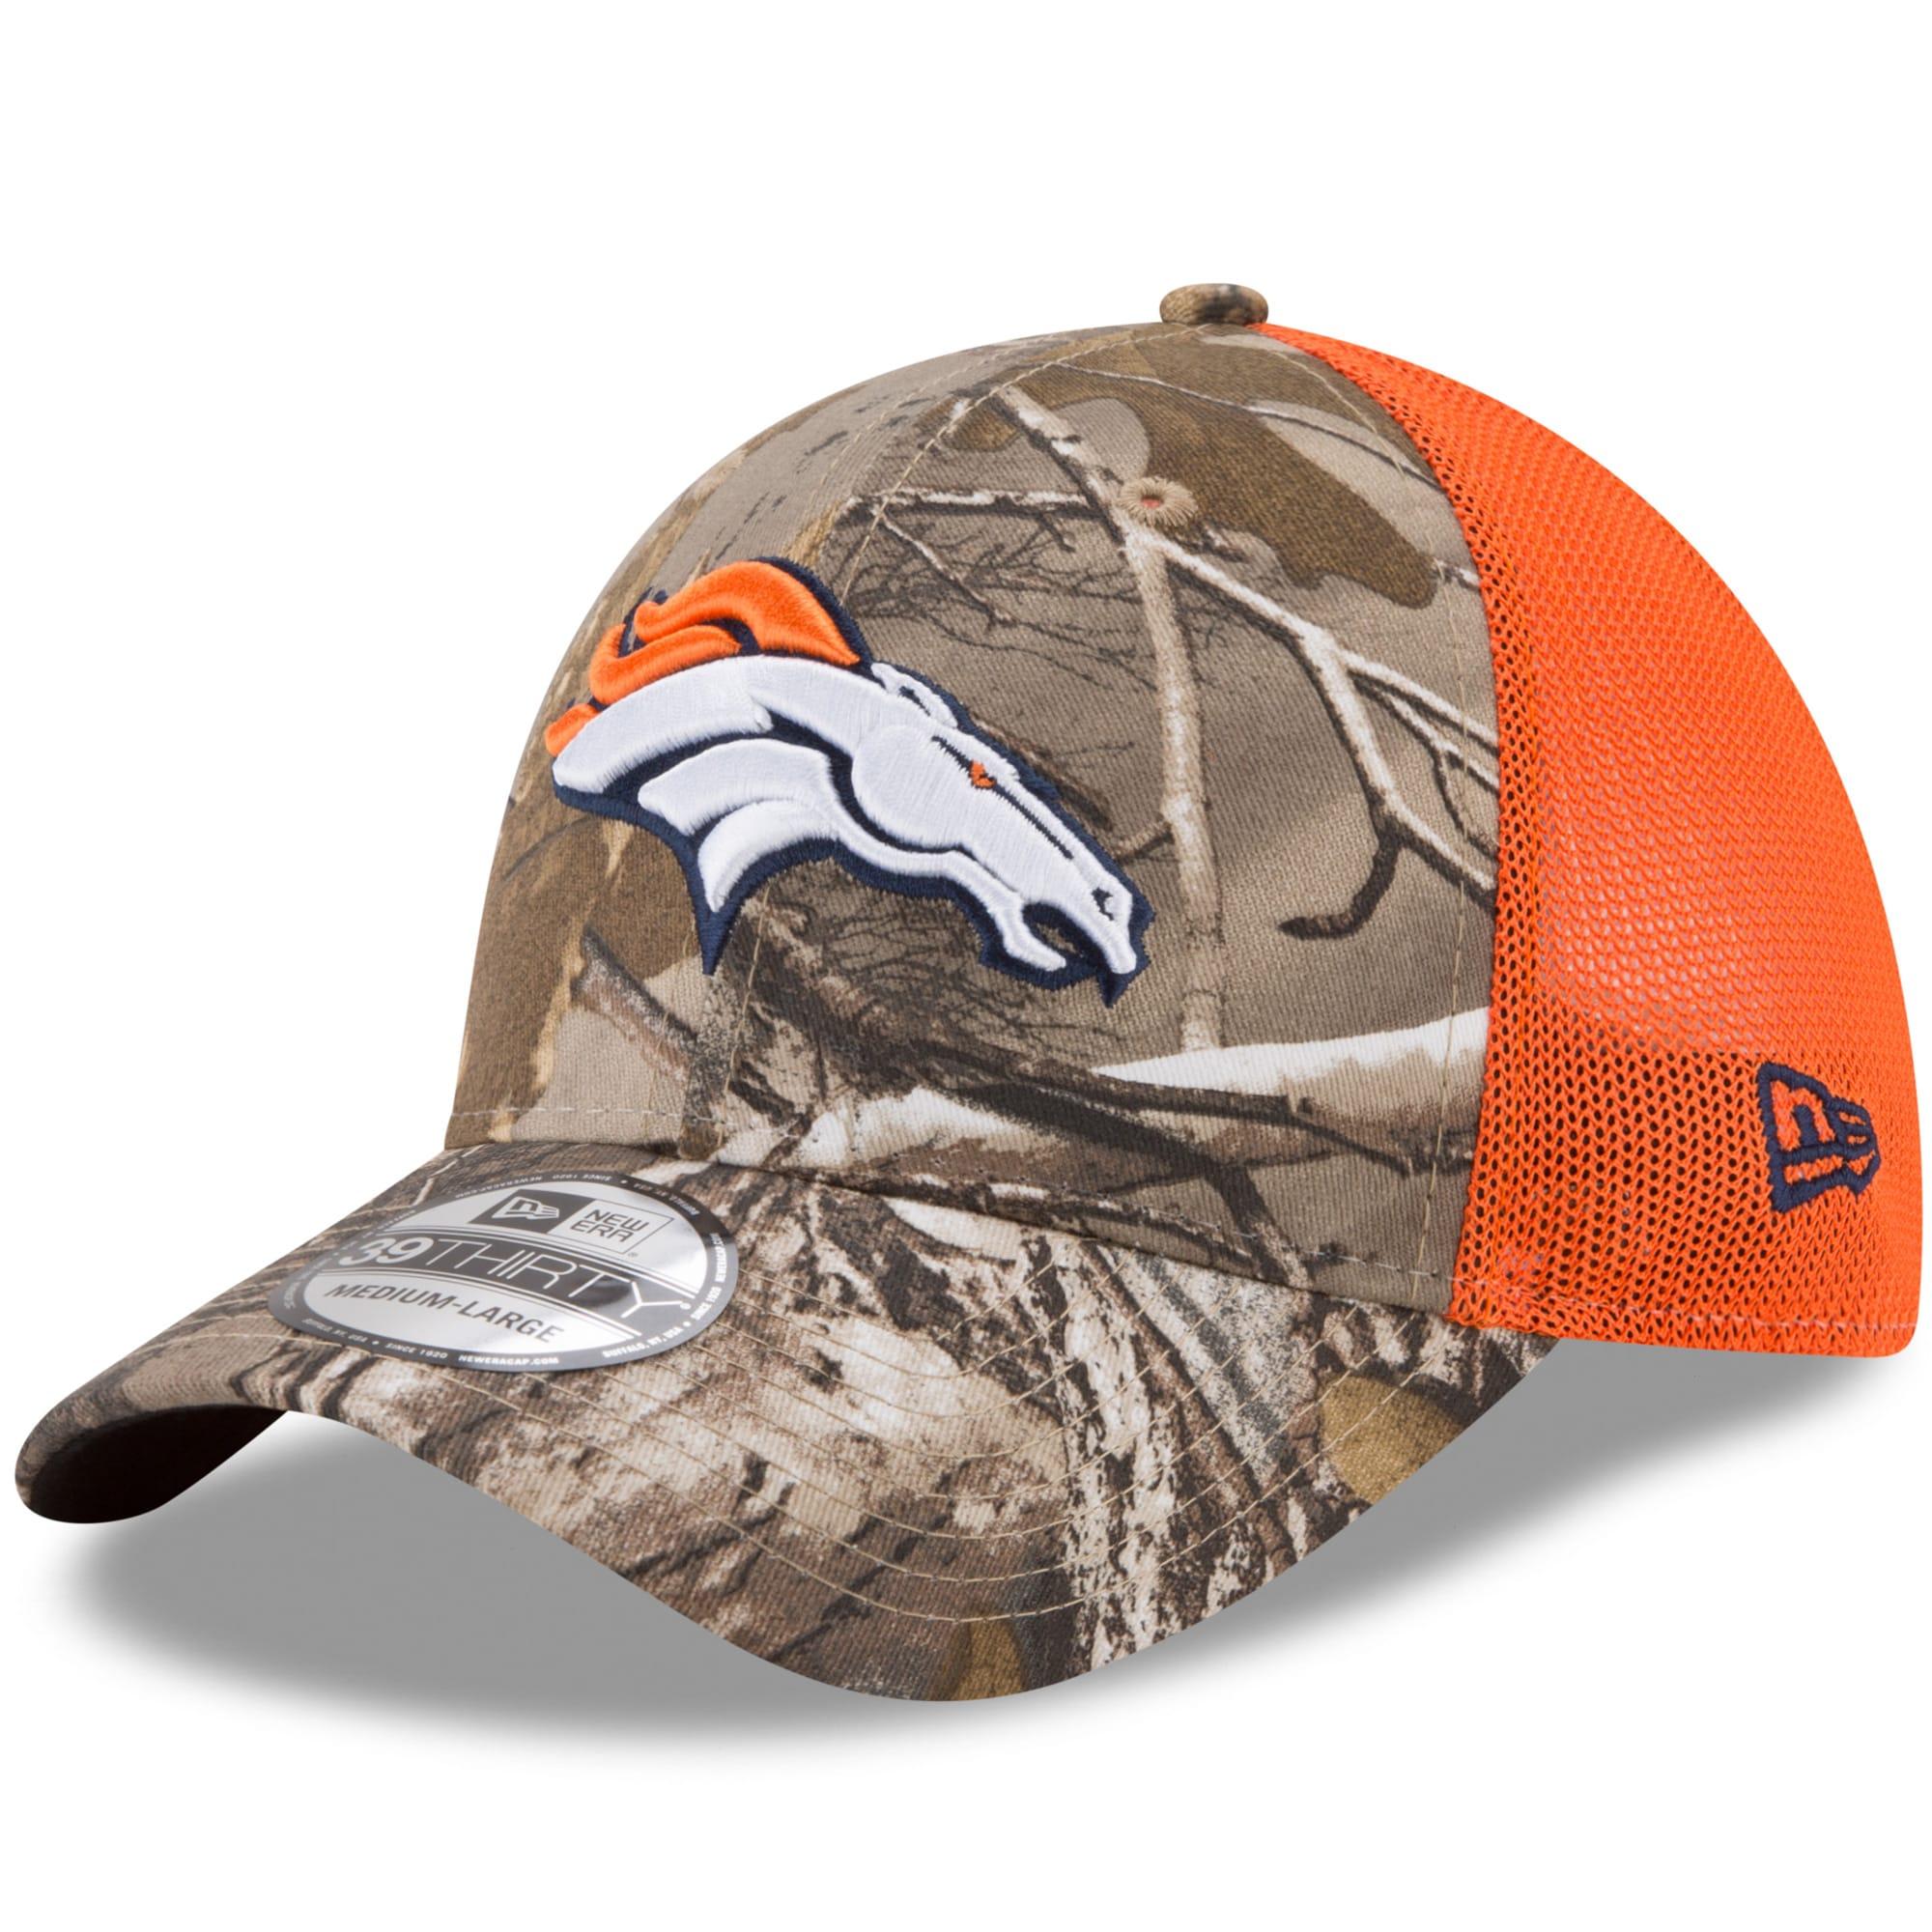 Denver Broncos New Era Trucker 39THIRTY Flex Hat - Realtree Camo/Orange